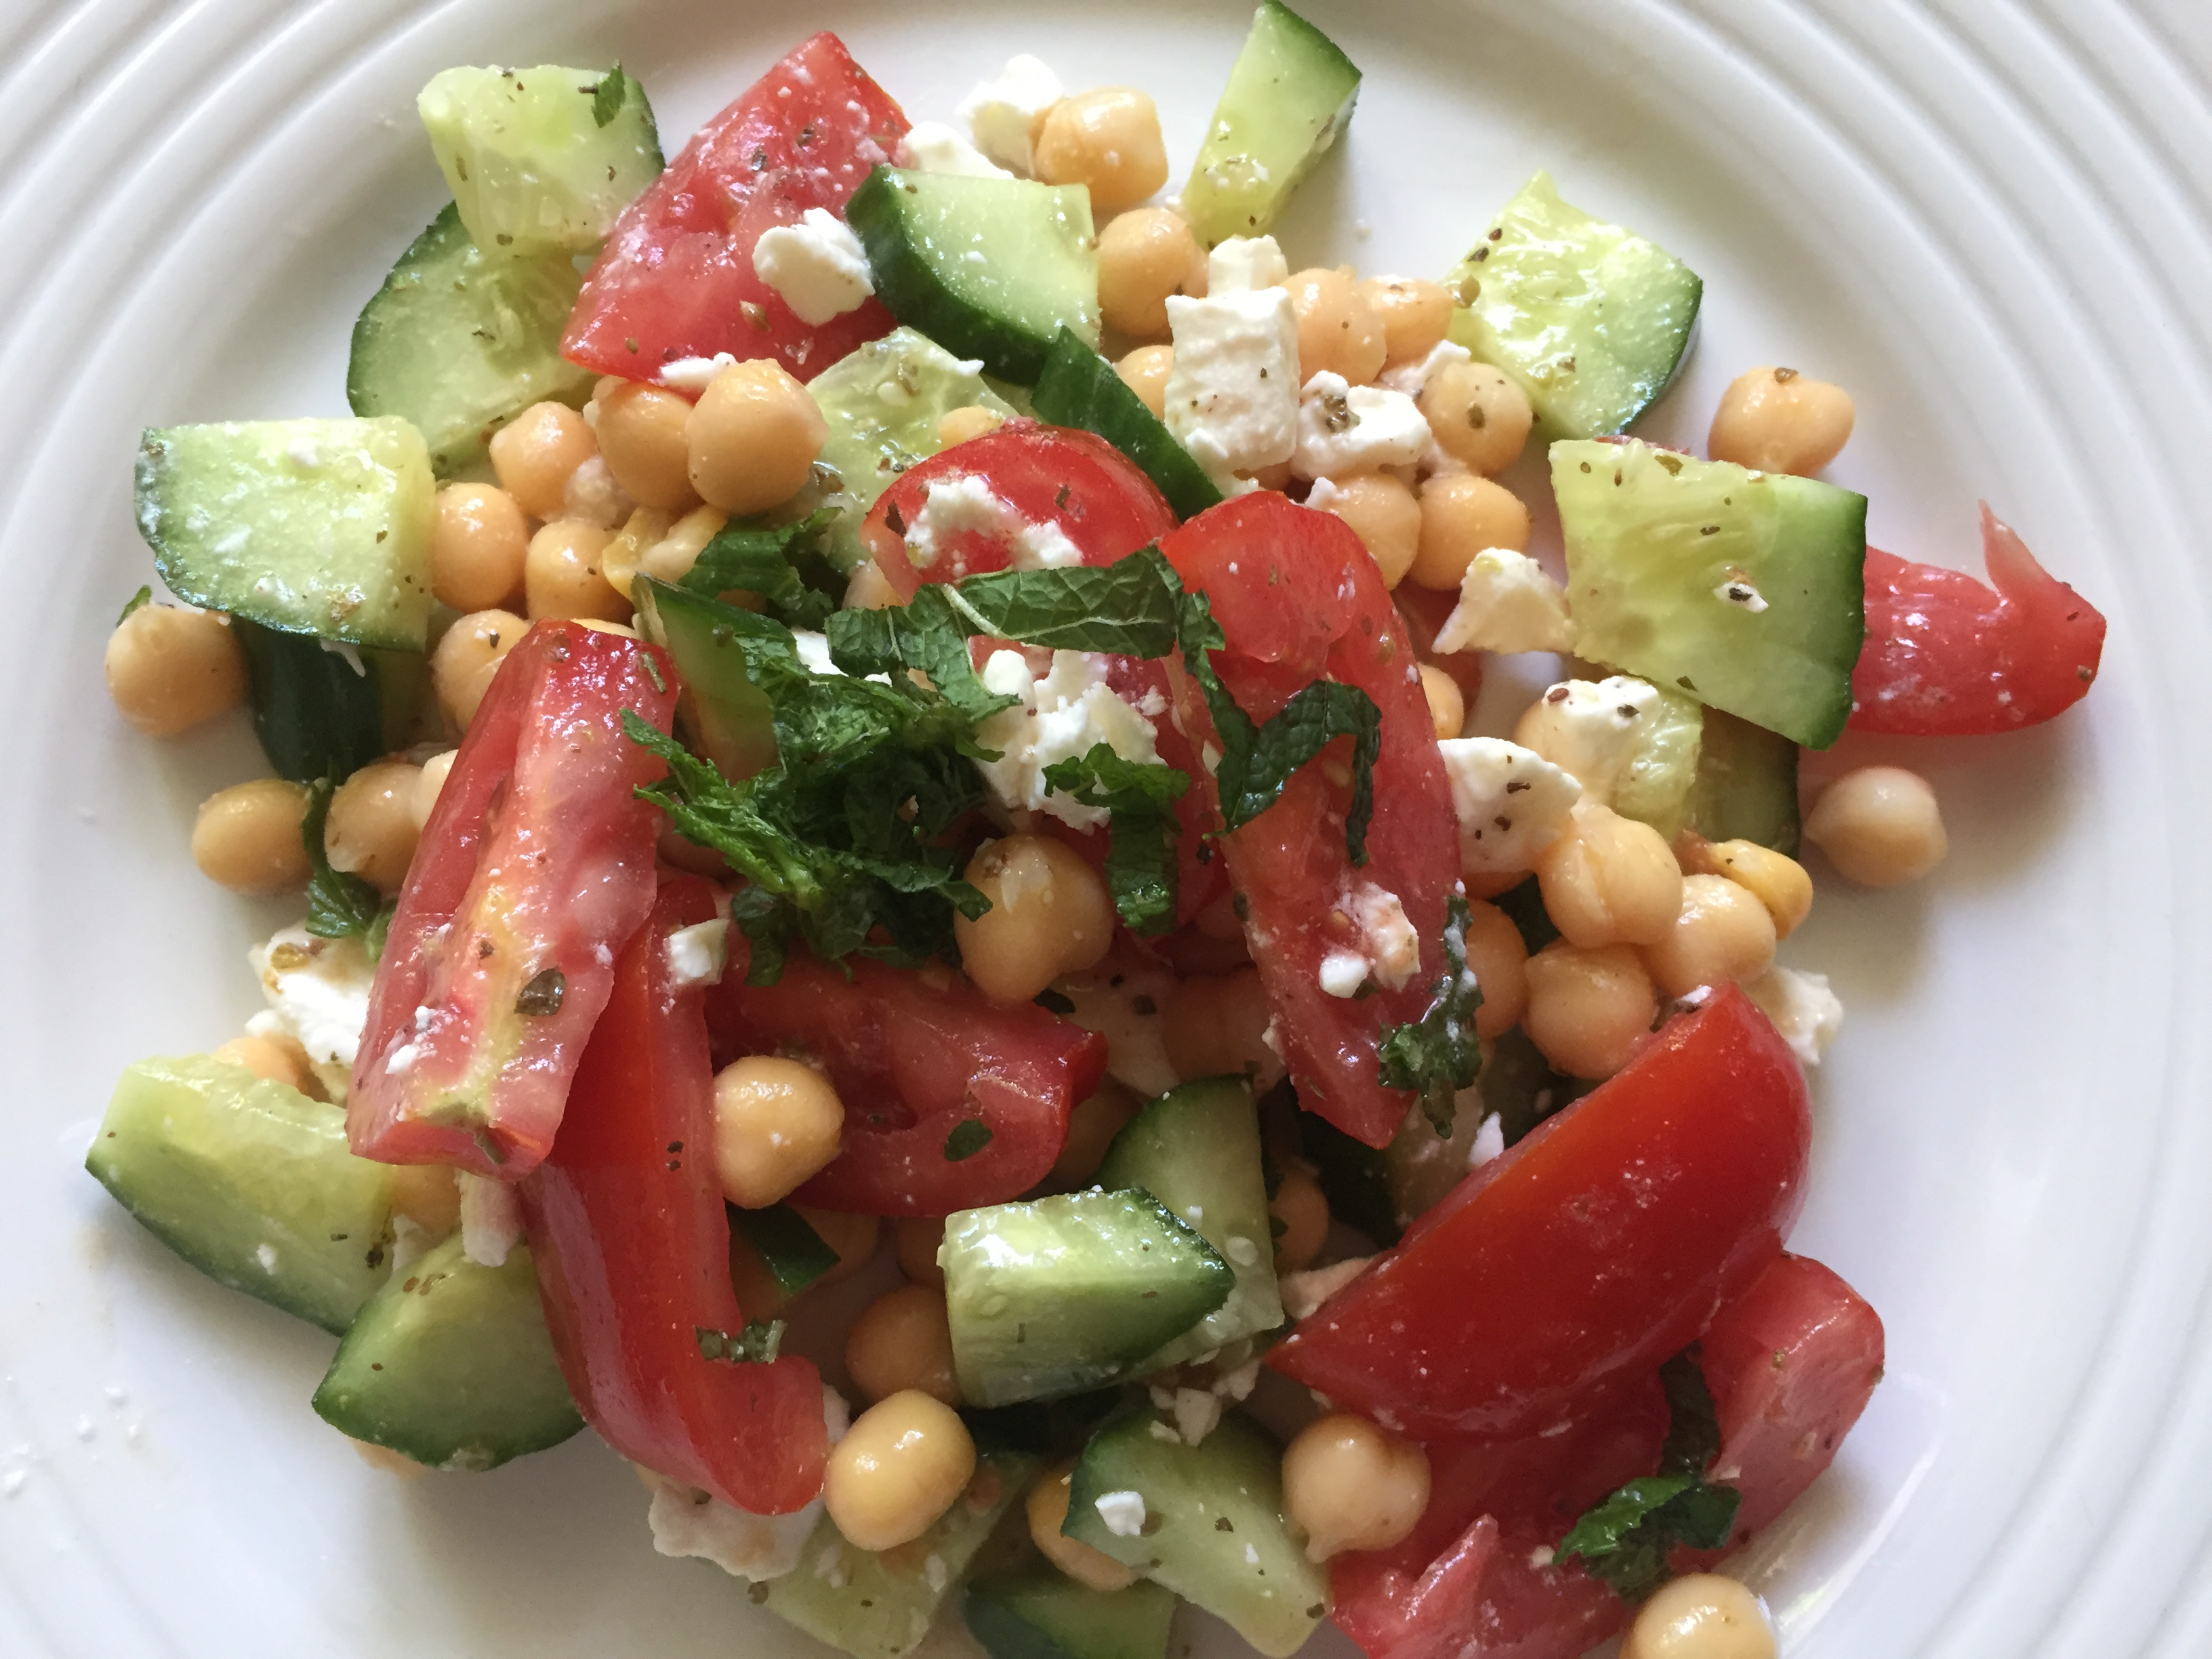 Chickpeas & feta salad + mint & zataar